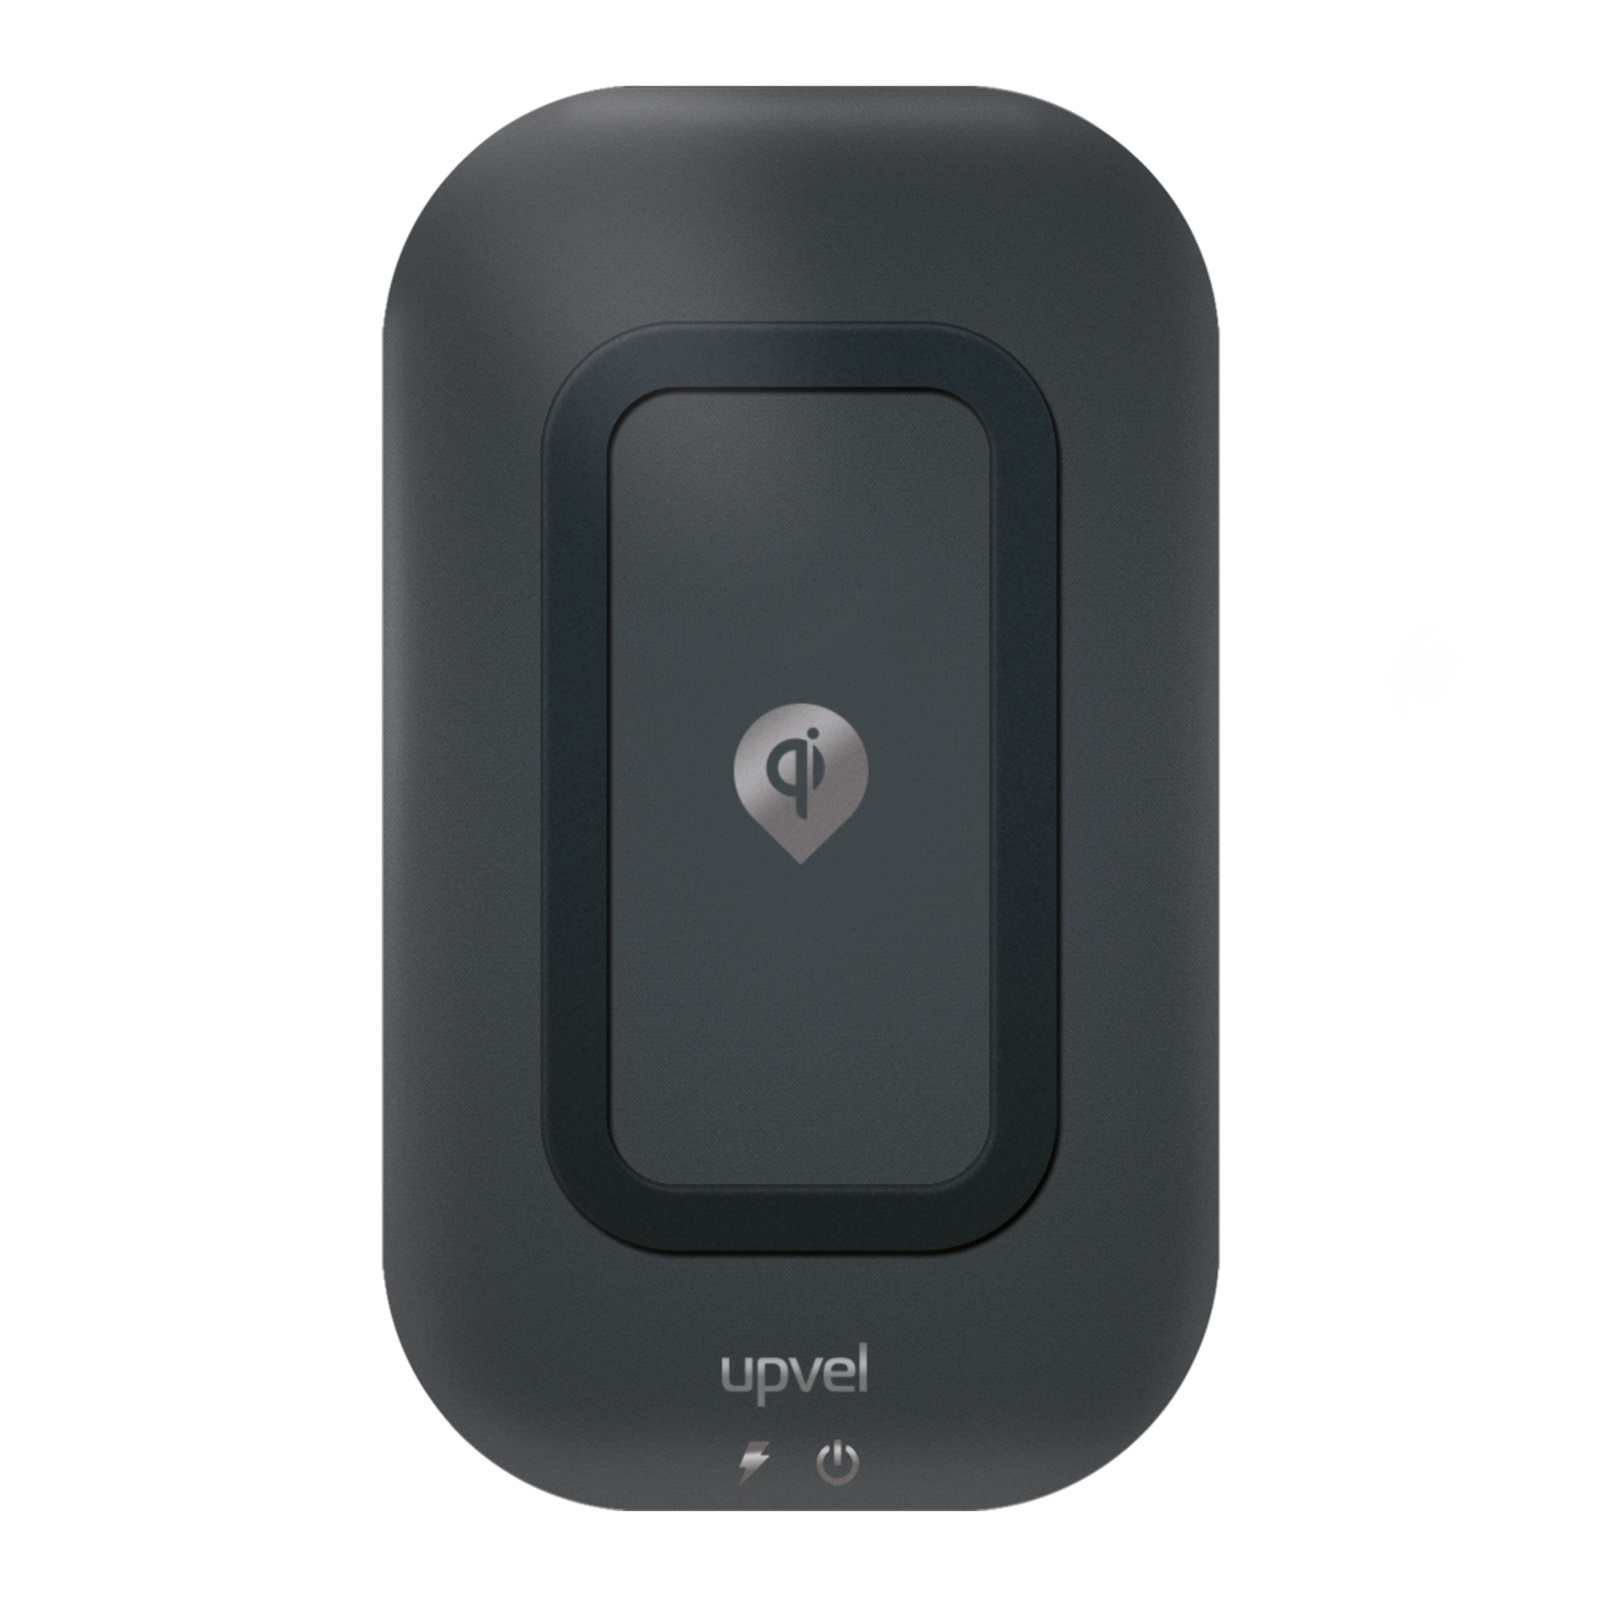 UPVEL UQ-TT01 Stingray, Black беспроводное зарядное устройство стандарта Qi все цены